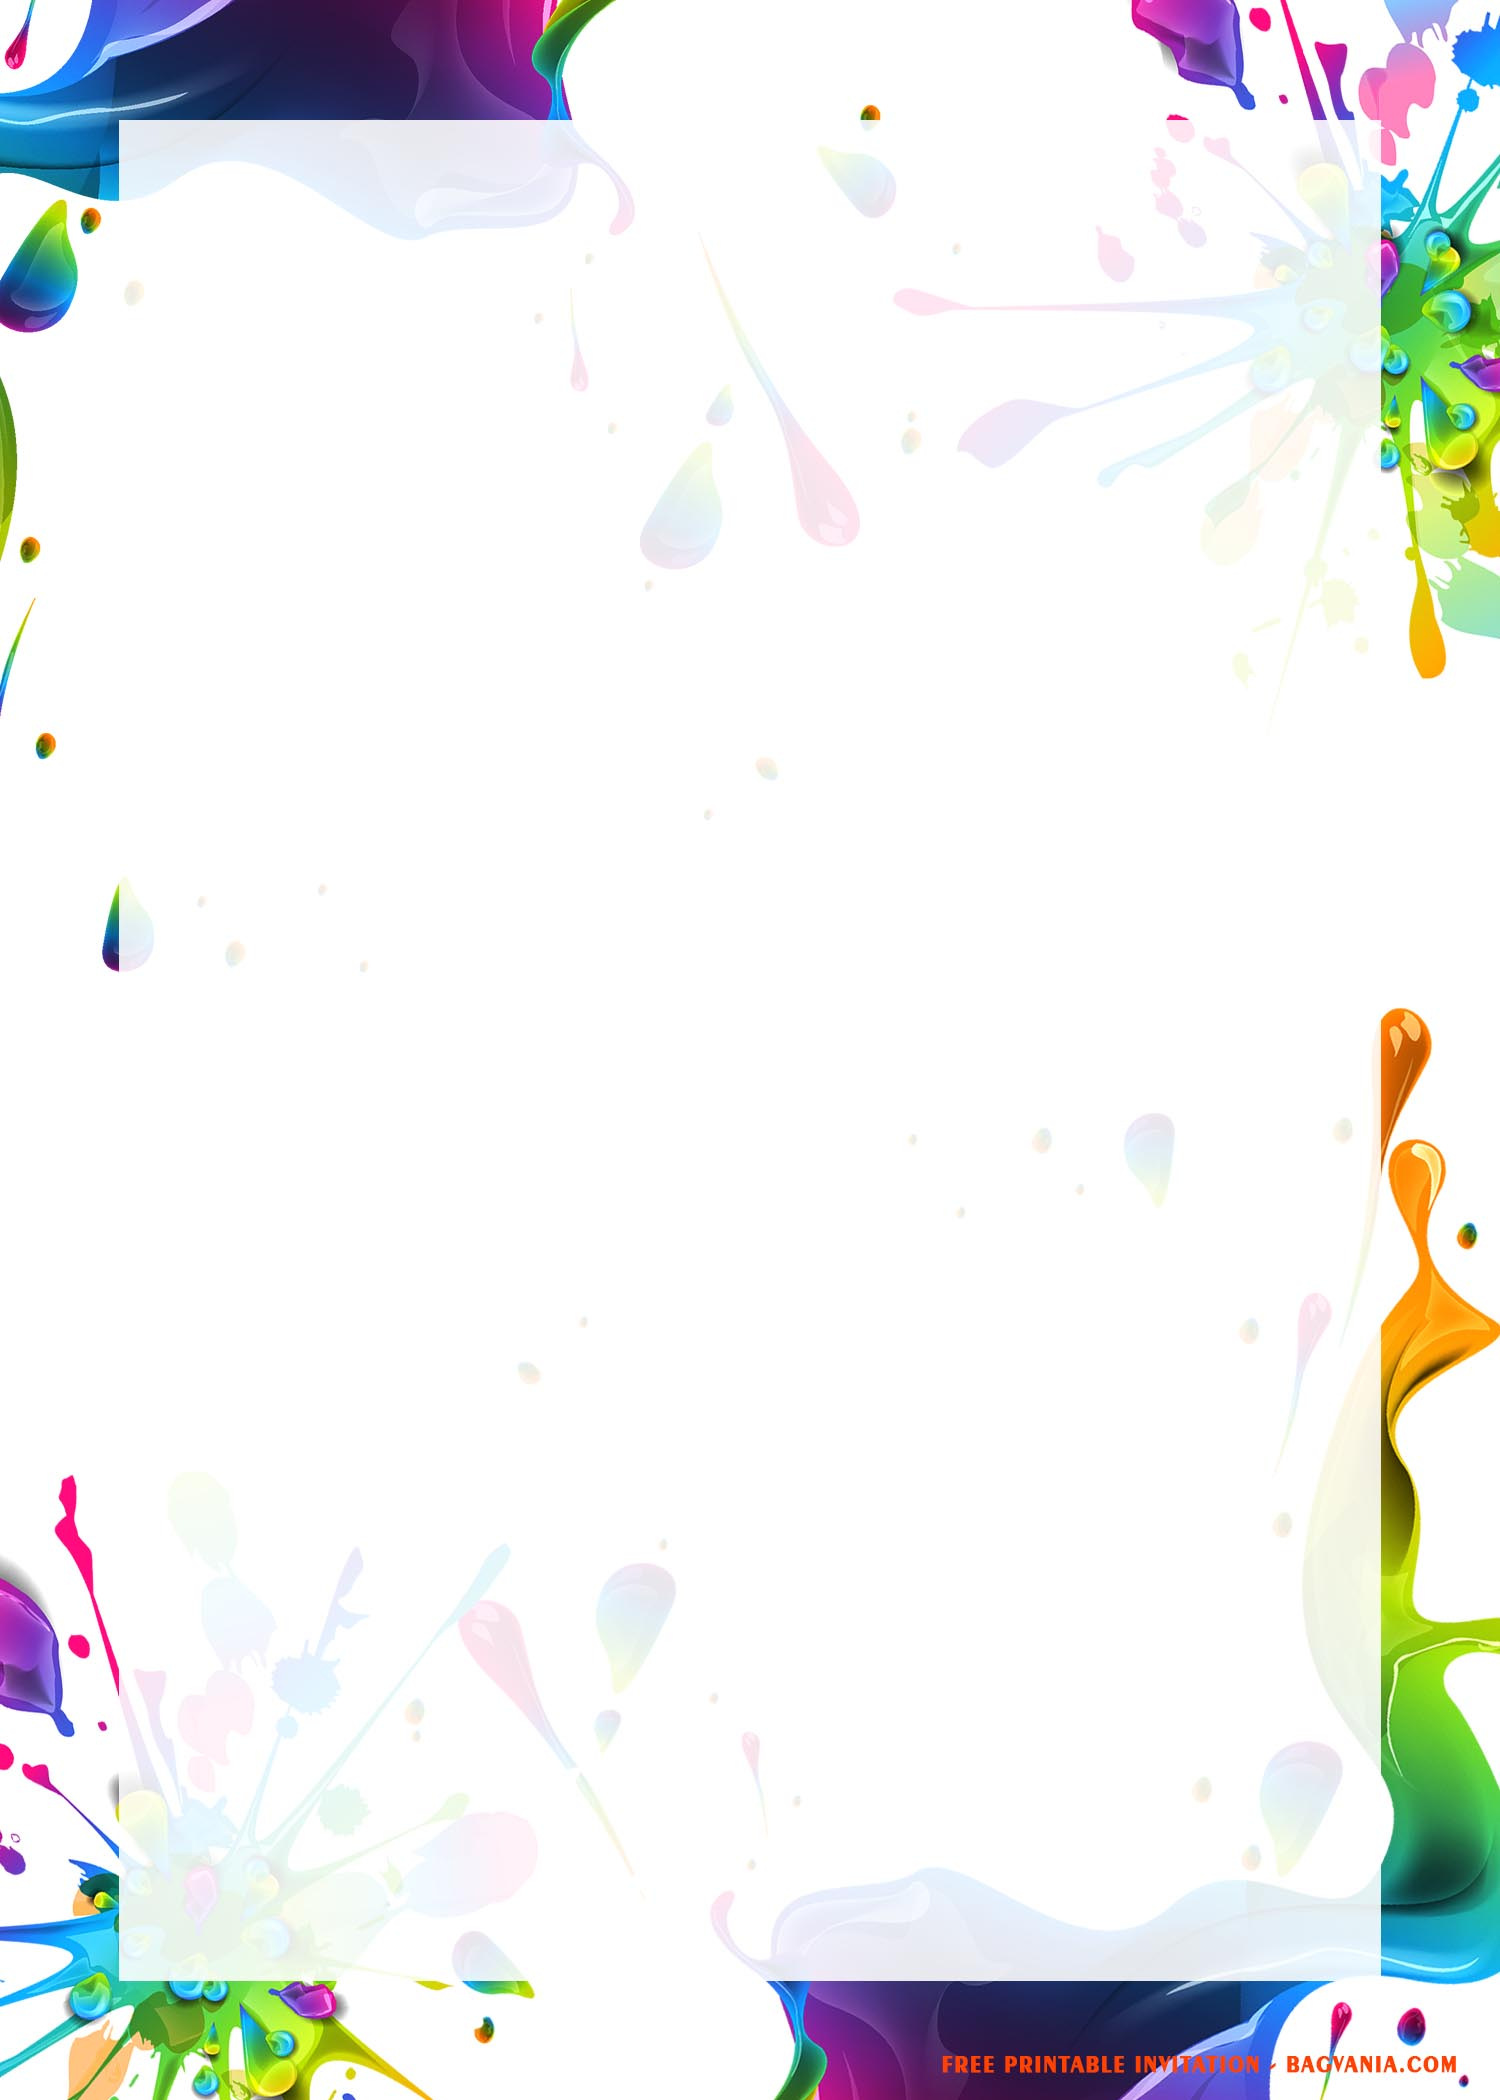 Free Printable Slime Birthday Party Invitation Templates Free Printable Birthday Invitation Templates Bagvania